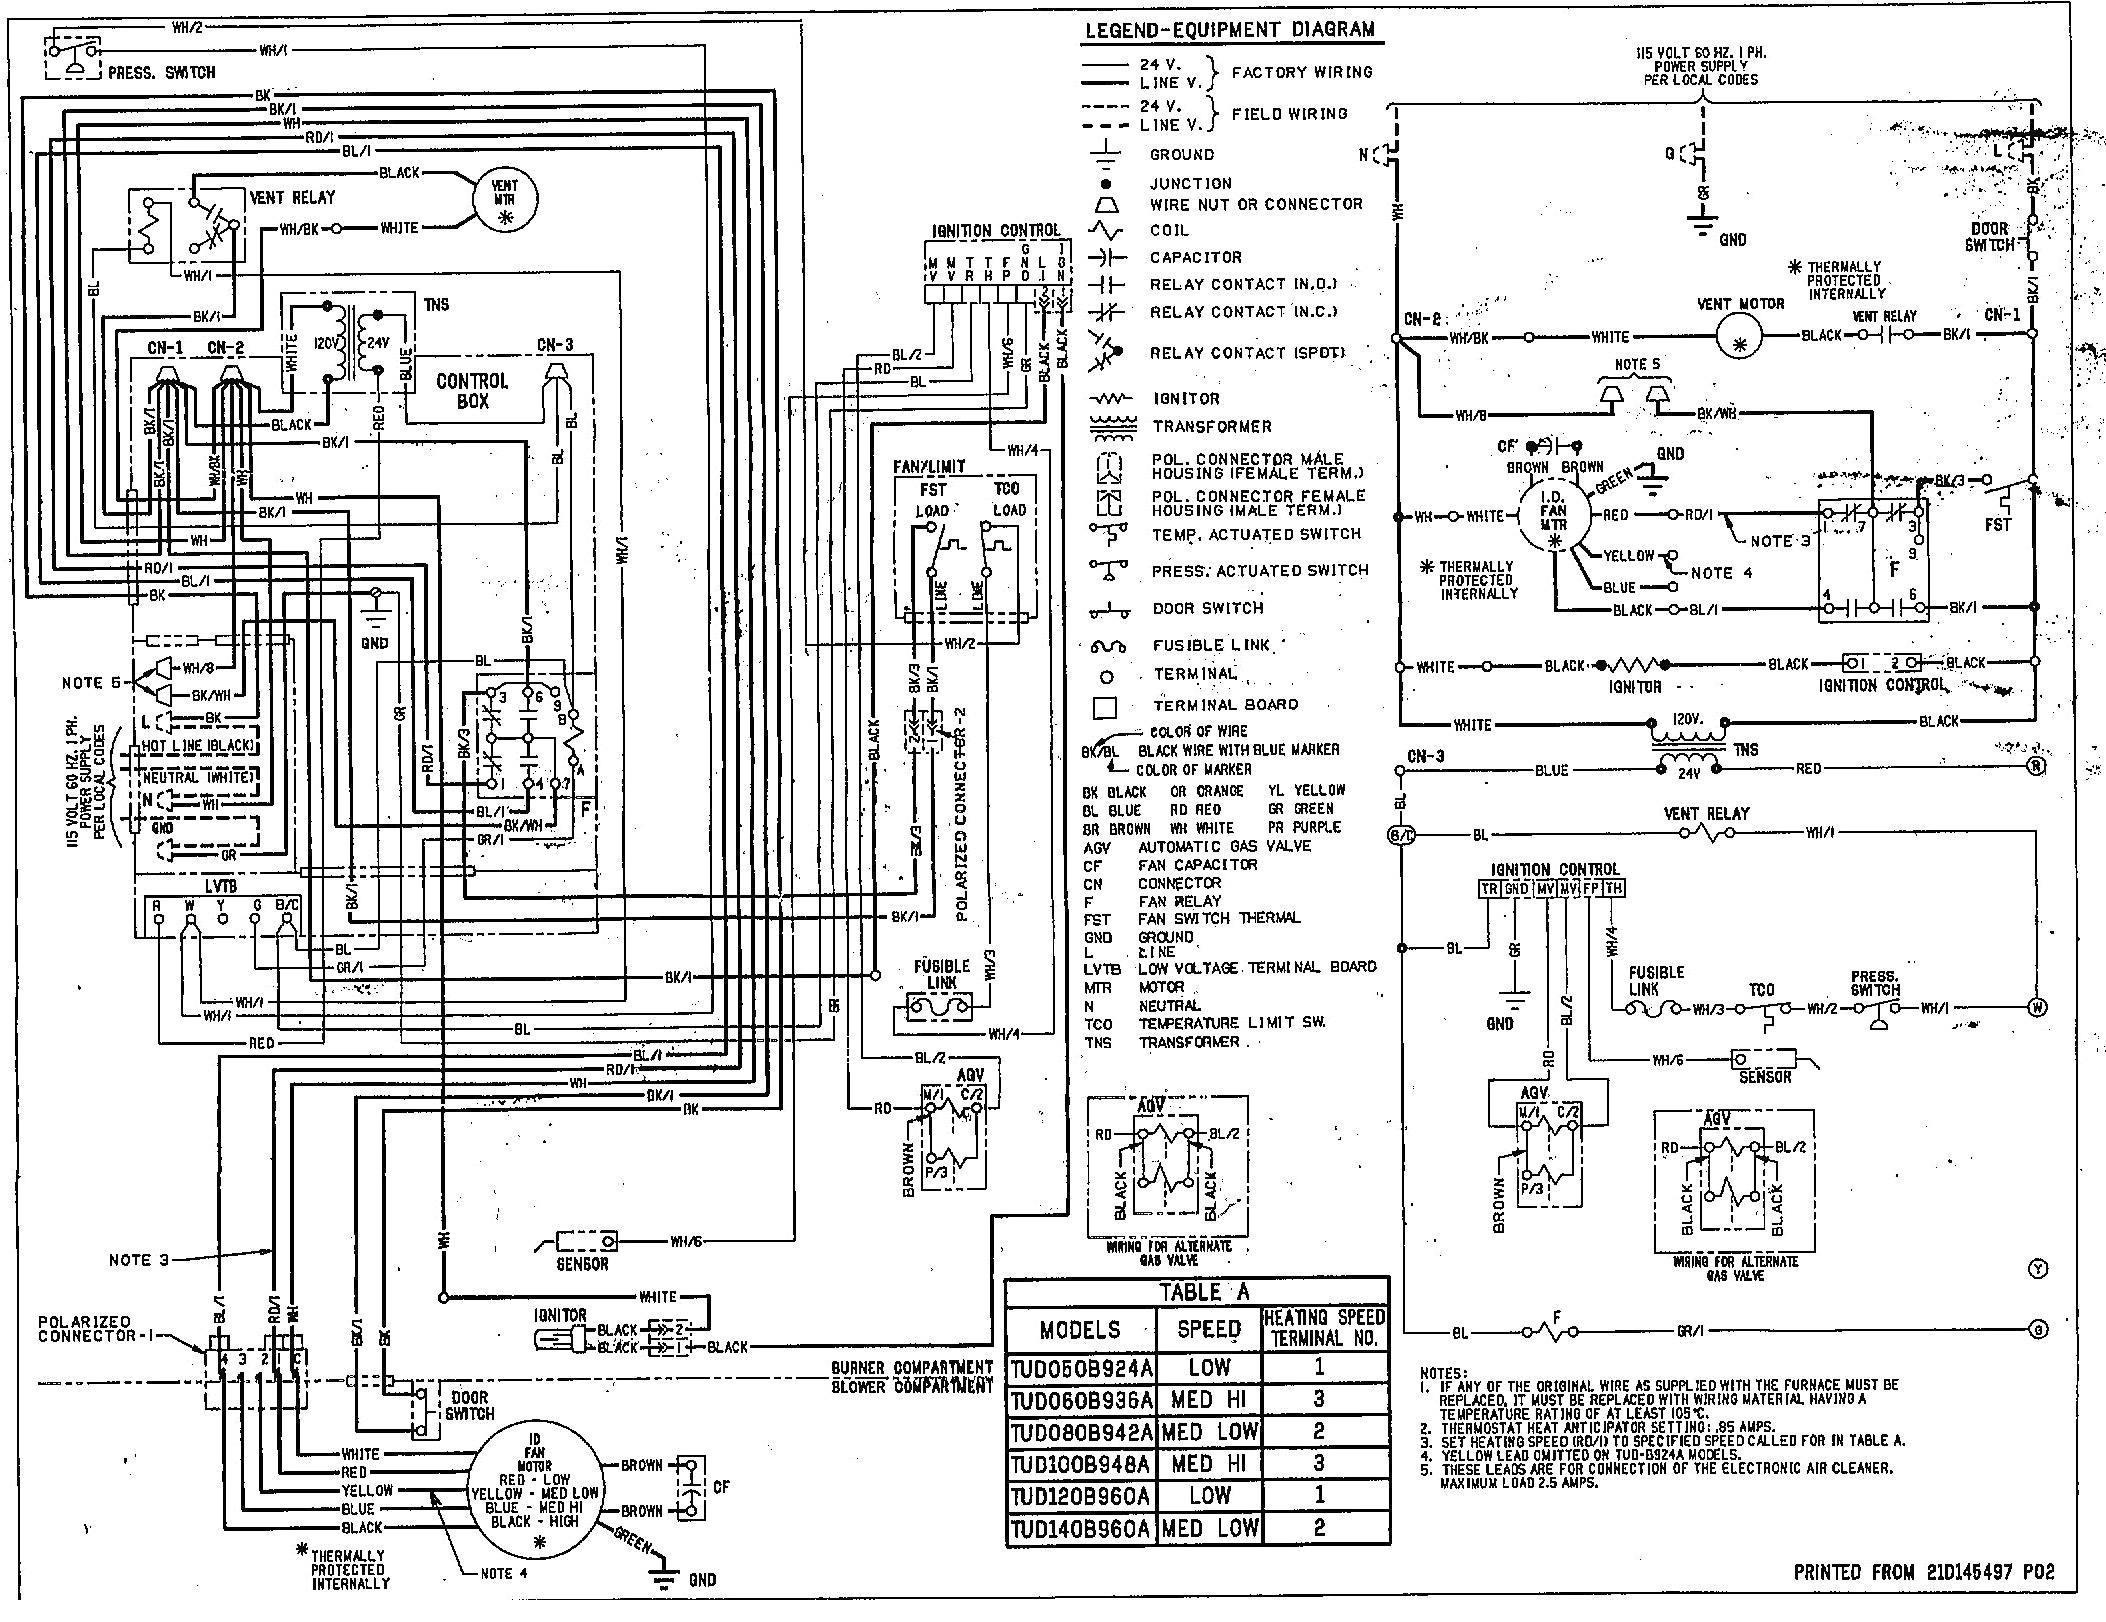 hvac wiring diagram for trane 1200 xl